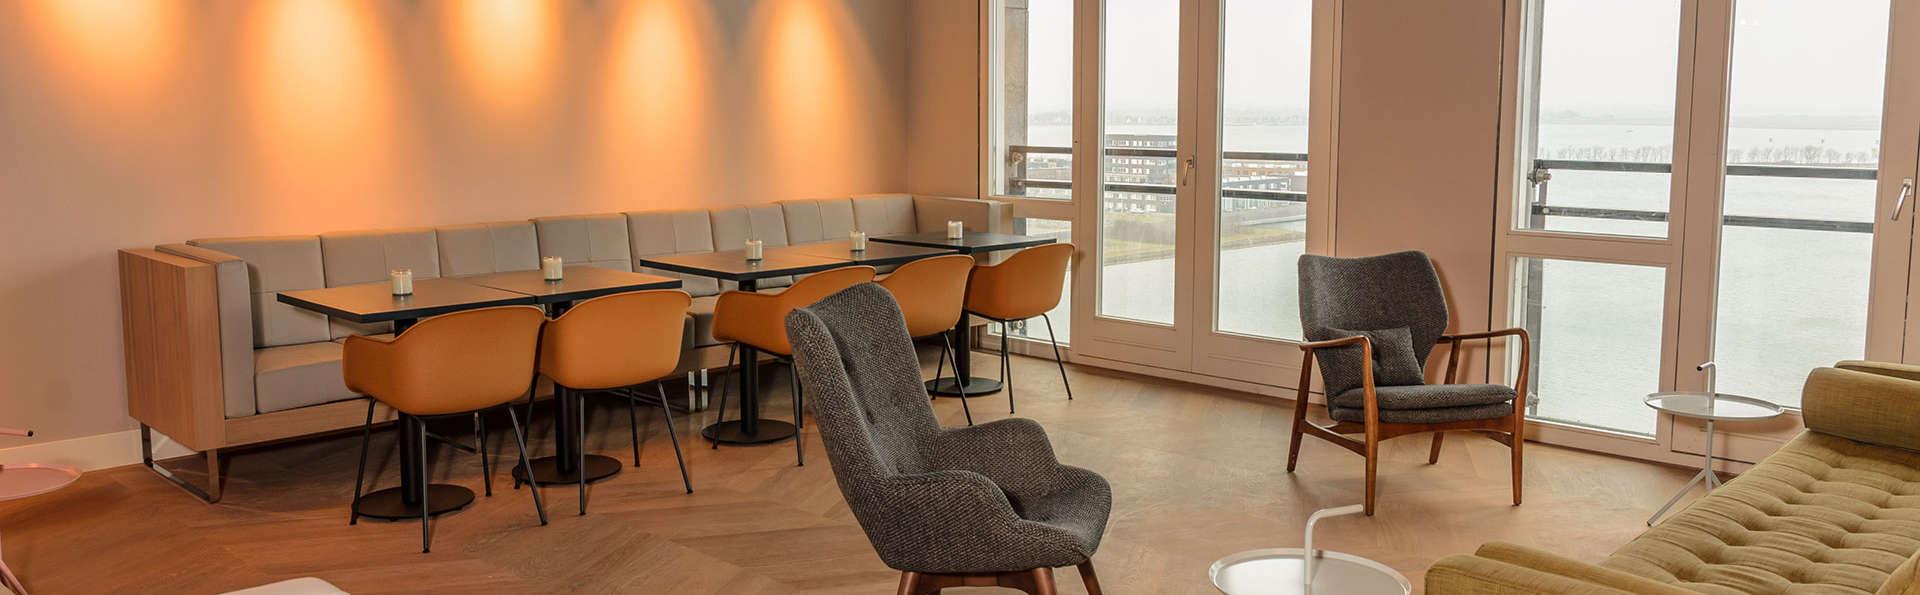 Amadi Panorama Hotel Amadi Panorama Hotel 4 Amsterdam Pays Bas